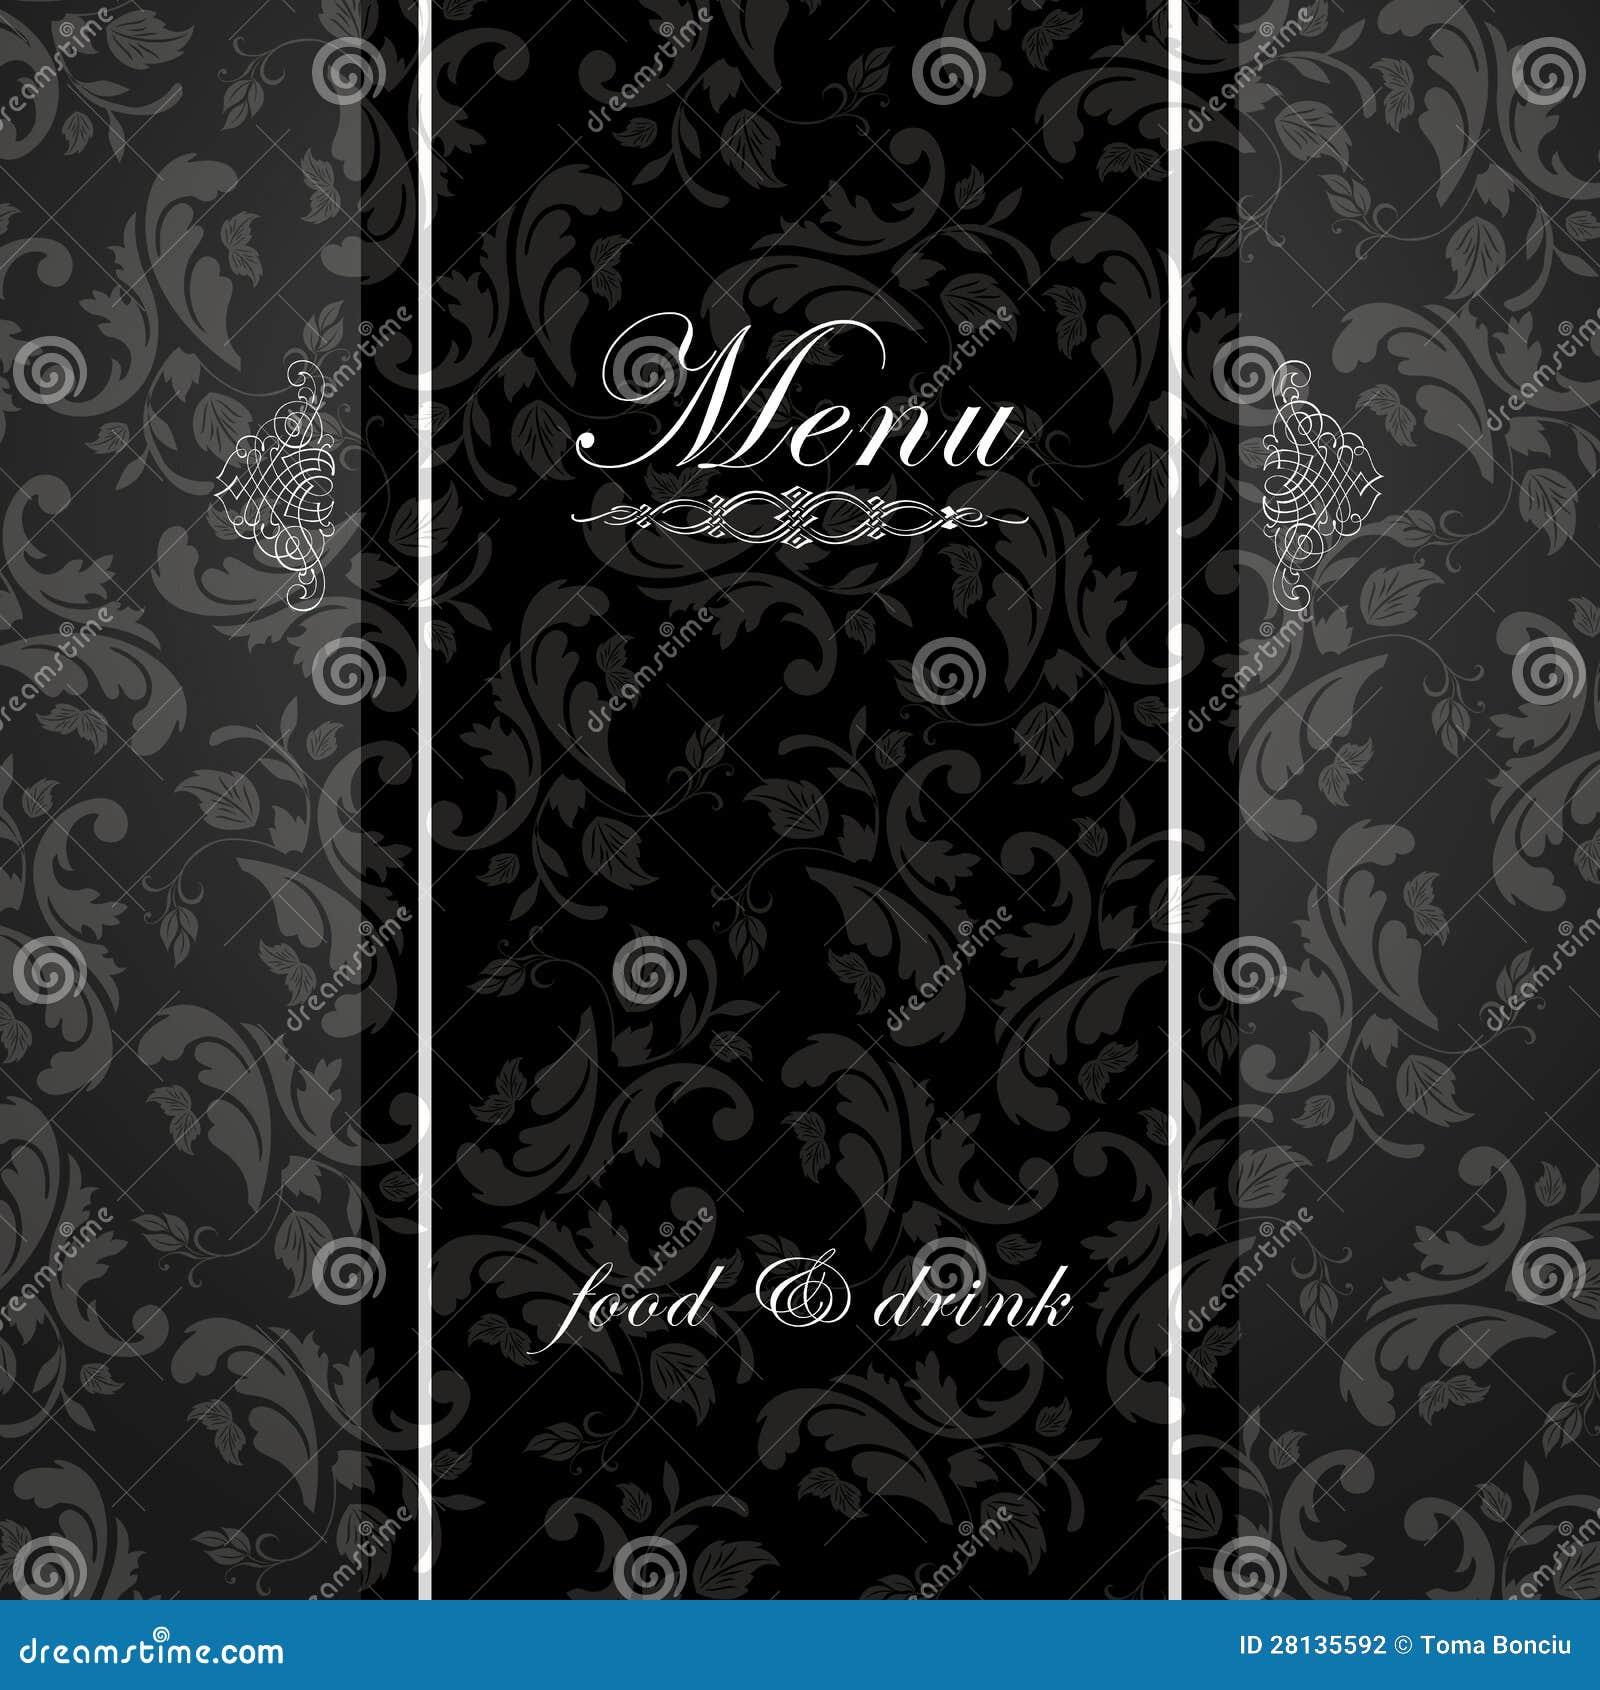 Elegant Restaurant Menu Design Stock Illustration Illustration Of Silver Gourmet 28135592